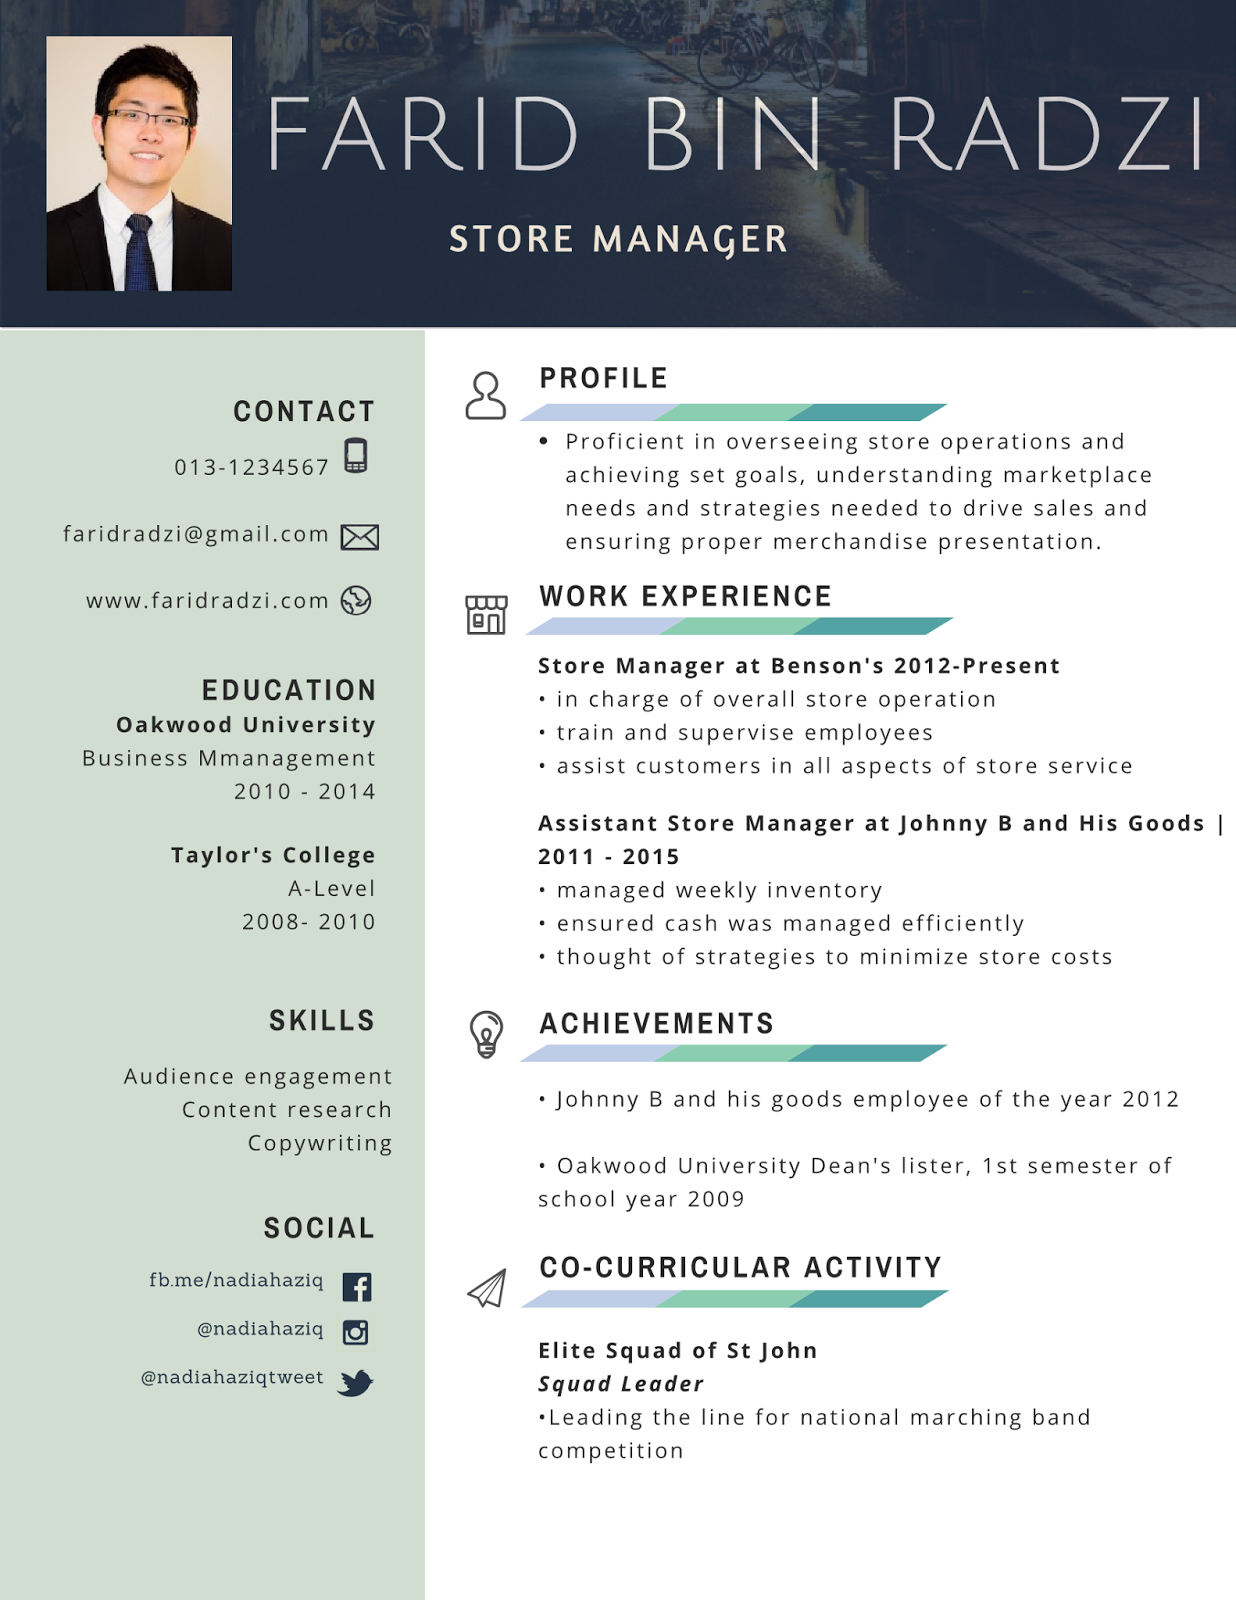 Resume Koleksi Contoh Resume Lengkap Terbaik Dan Terkini